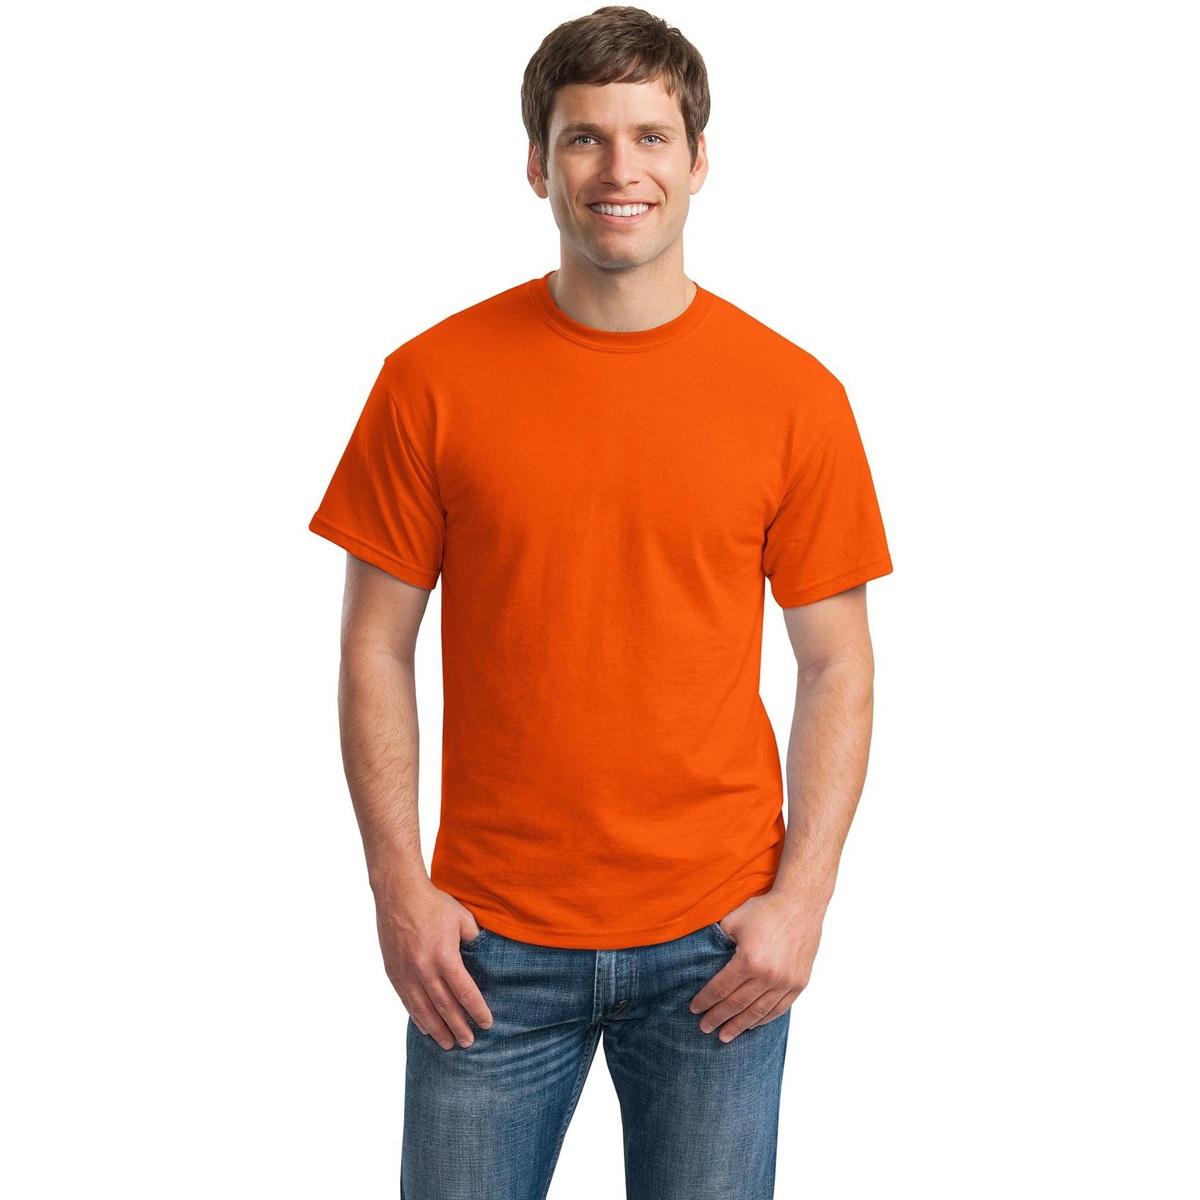 Gildan 8000 dryblend t shirt orange for Gildan 8000 t shirt